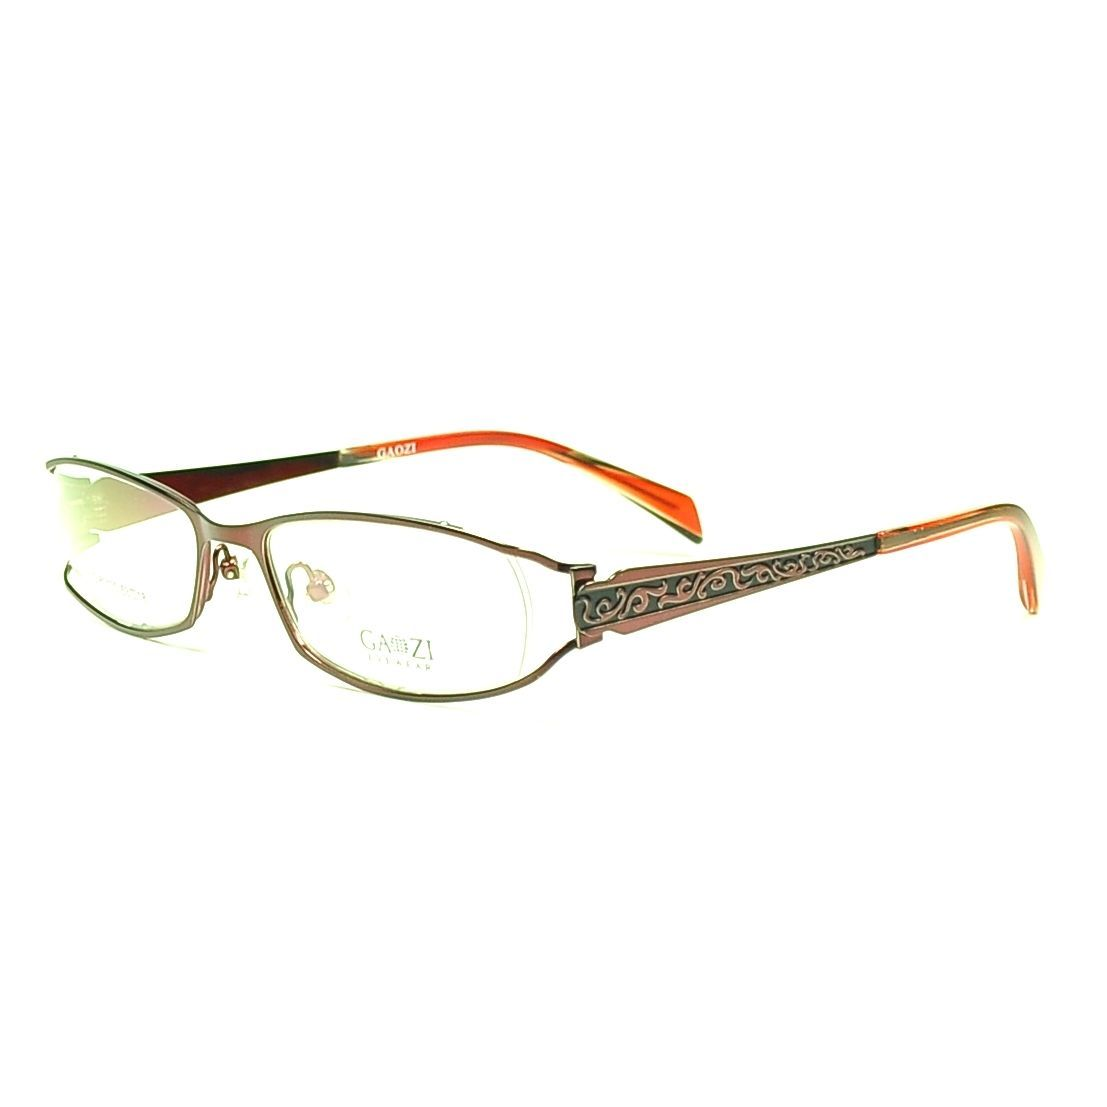 acf3891fe0 Eyeglass Frame Online Shopping In Bangladesh - Bitterroot Public Library